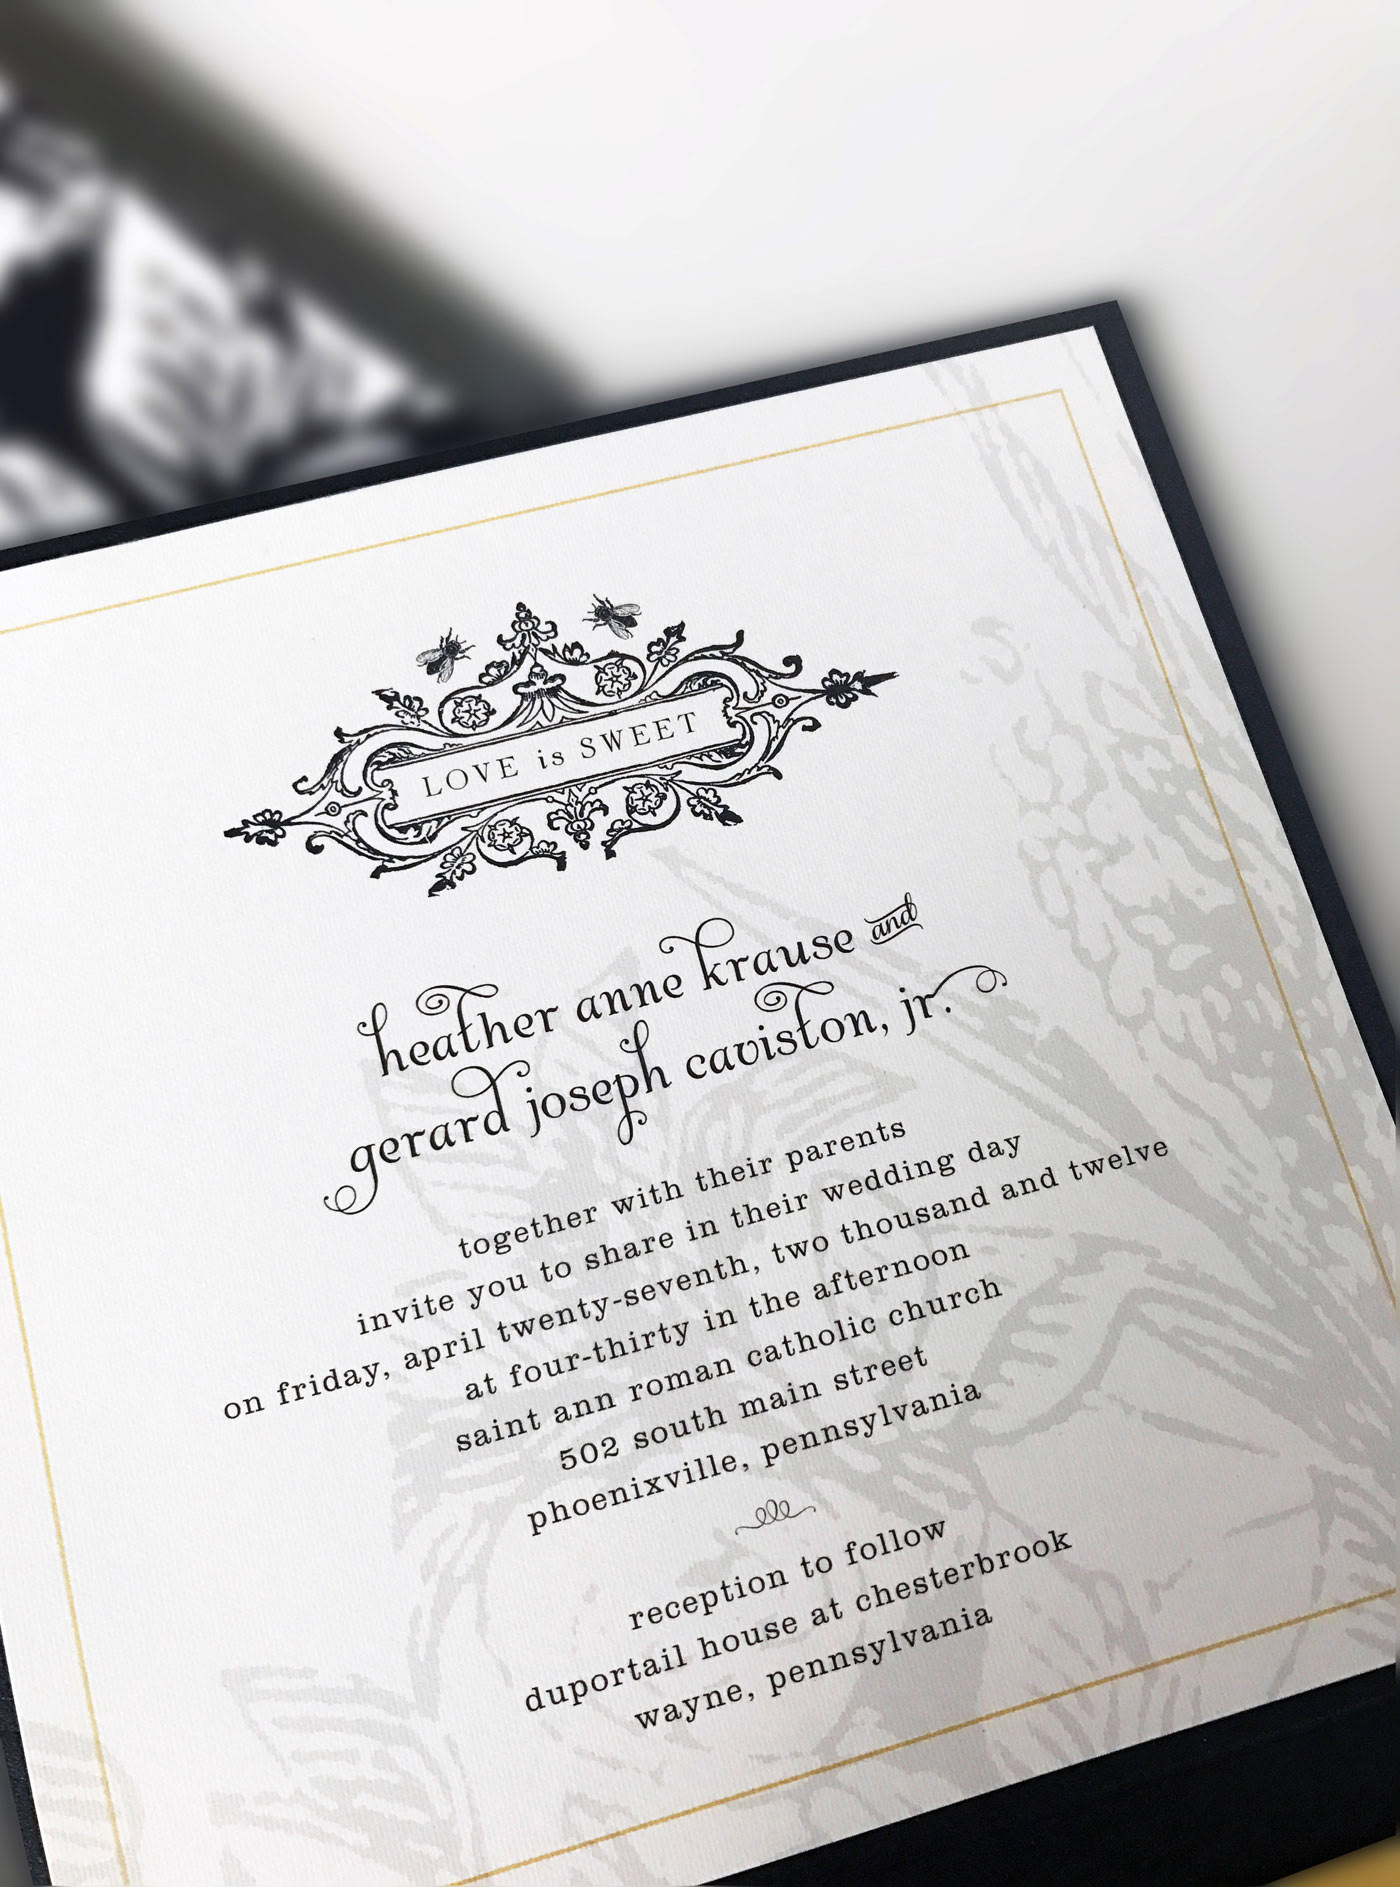 Heather Caviston - Cavistons | wedding invitation